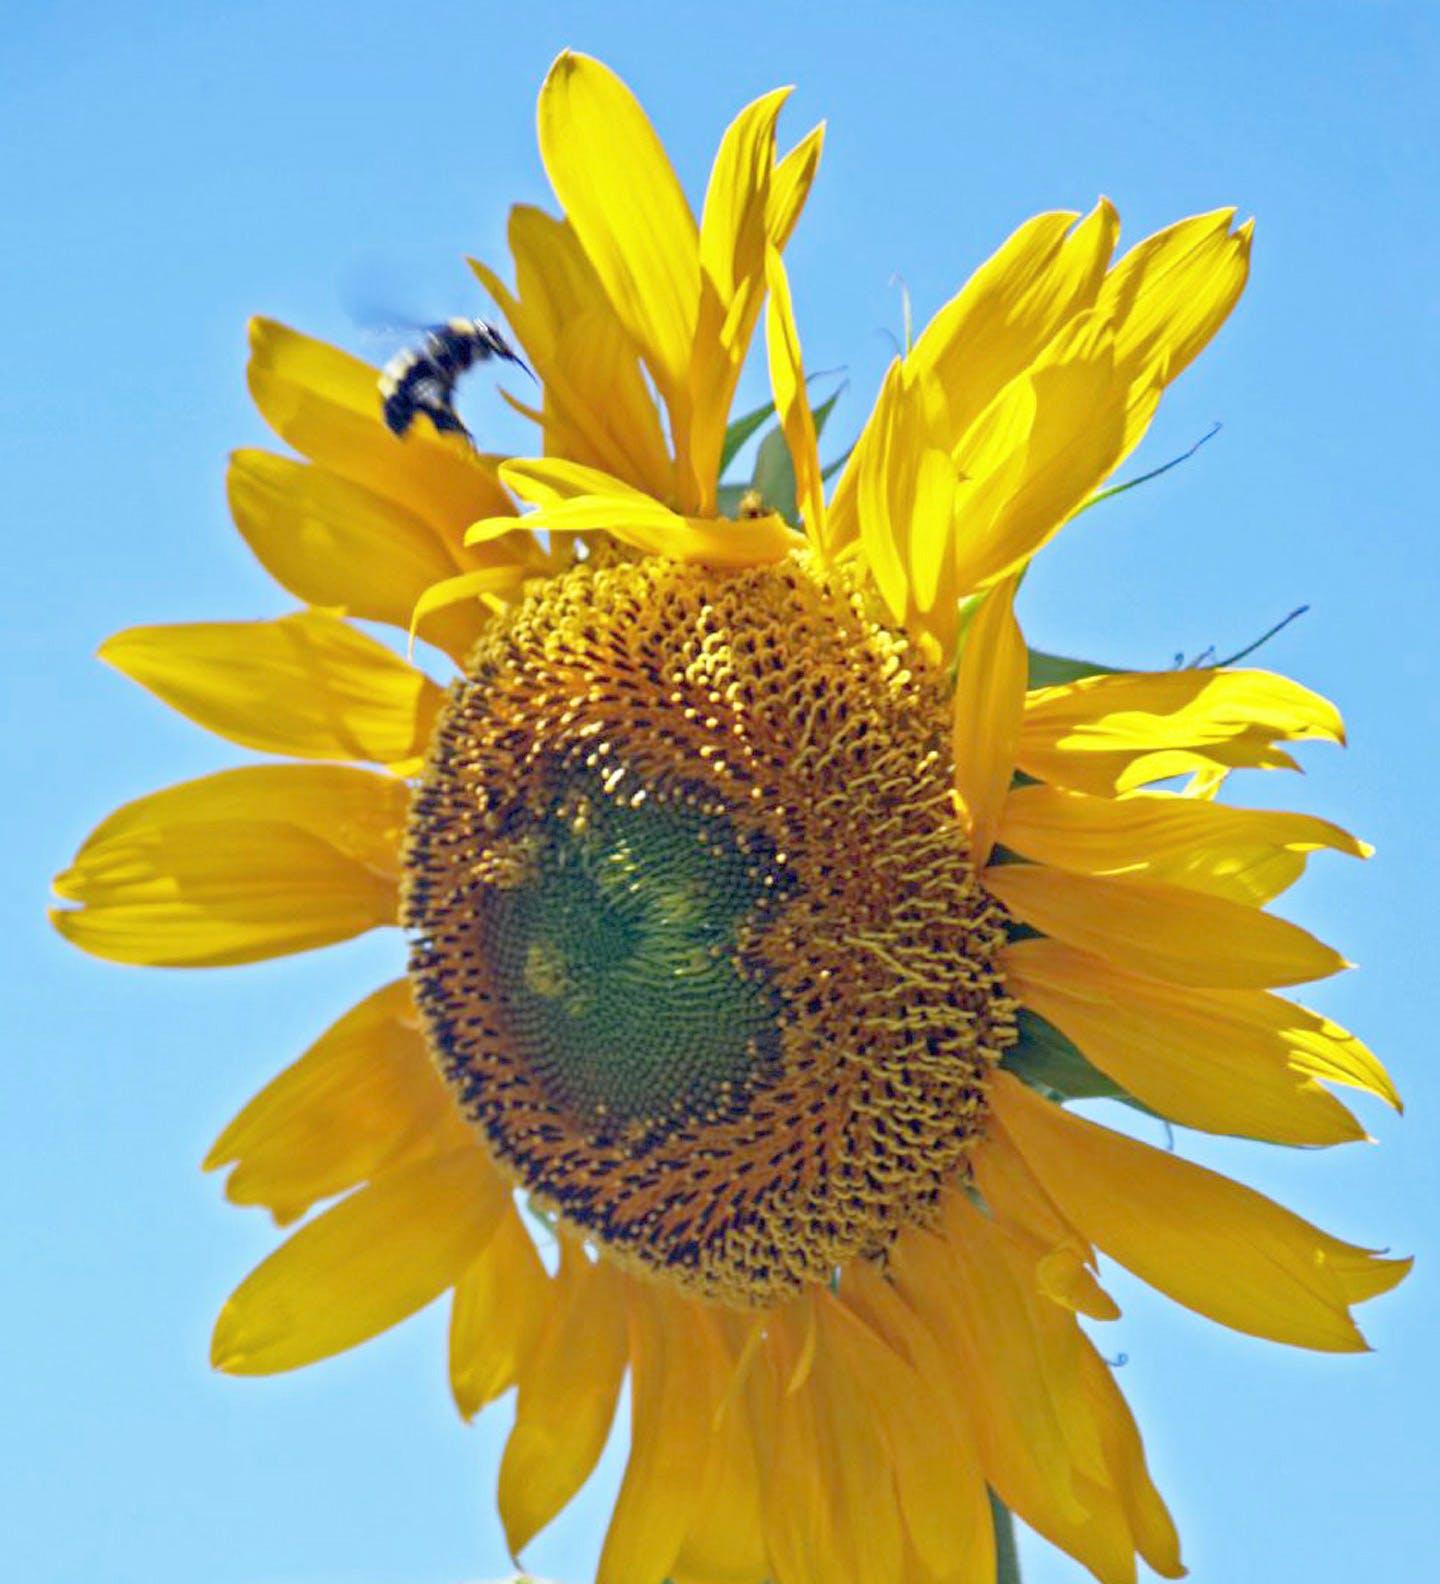 Free stock photo of sunflower